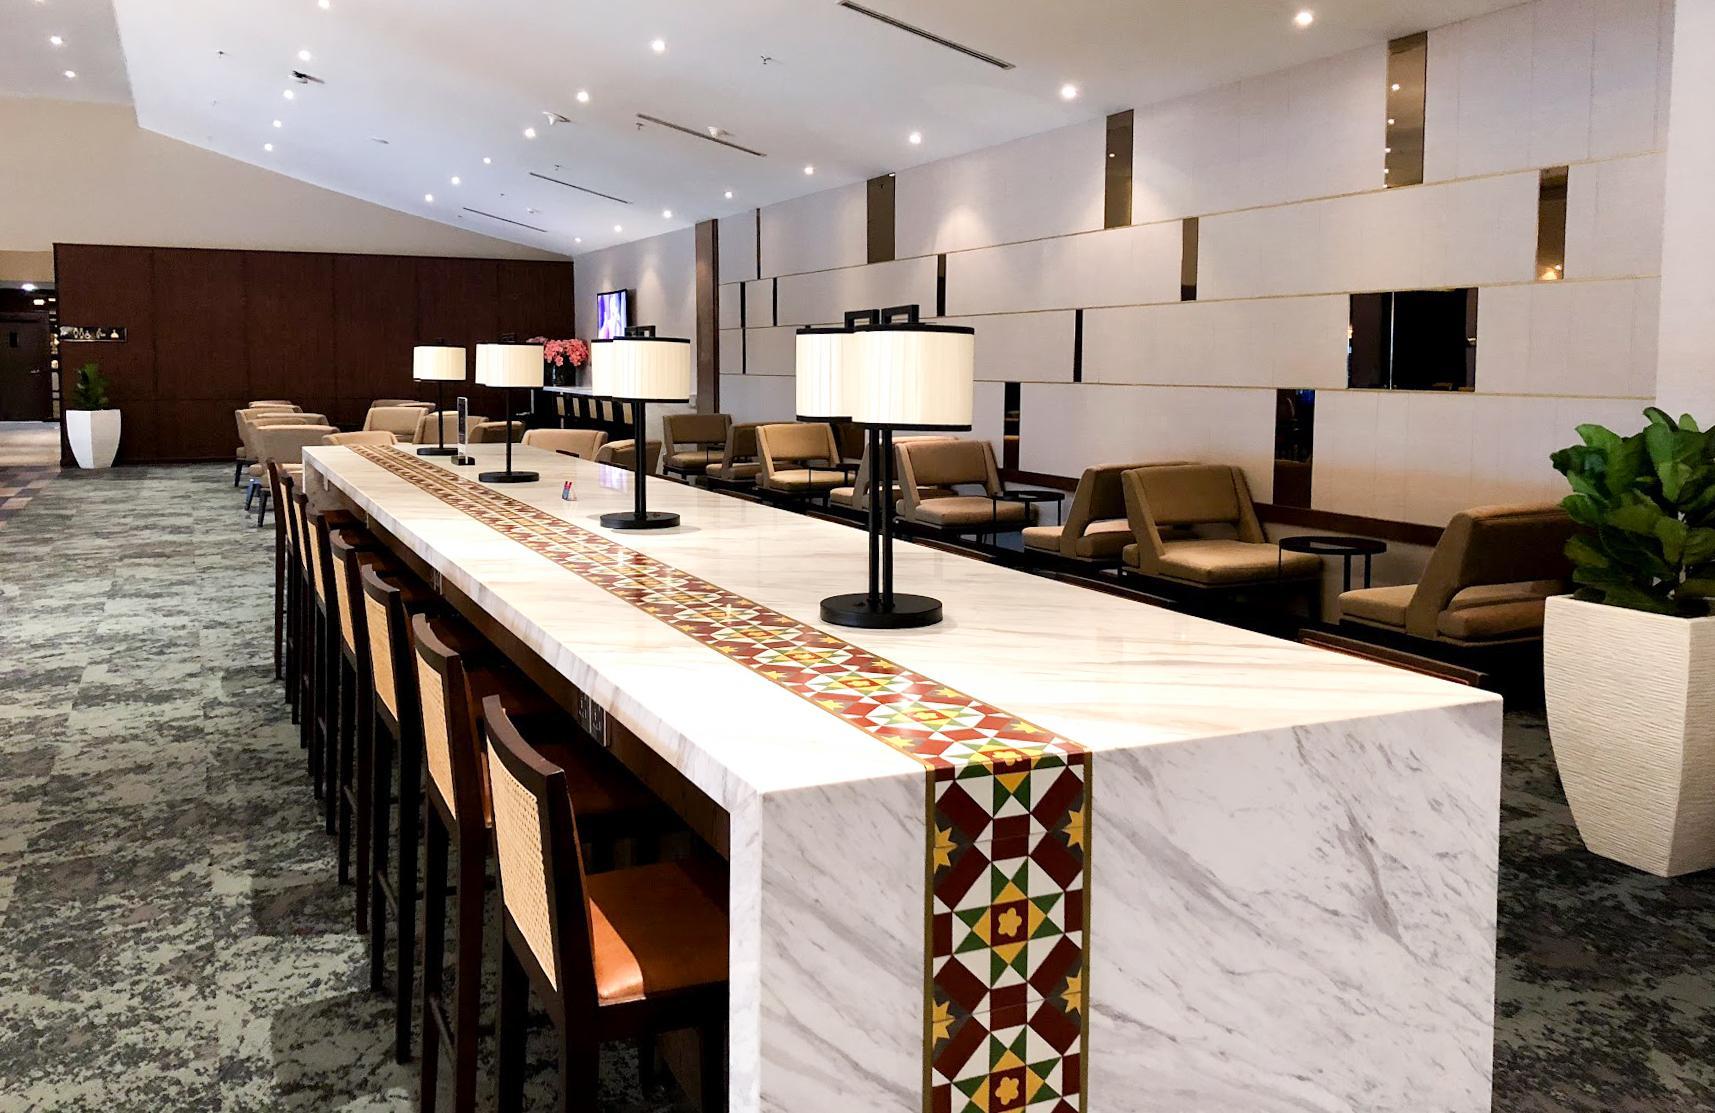 Malaysia Airlines Satellite Golden Lounge Kuala Lumpur high bar table